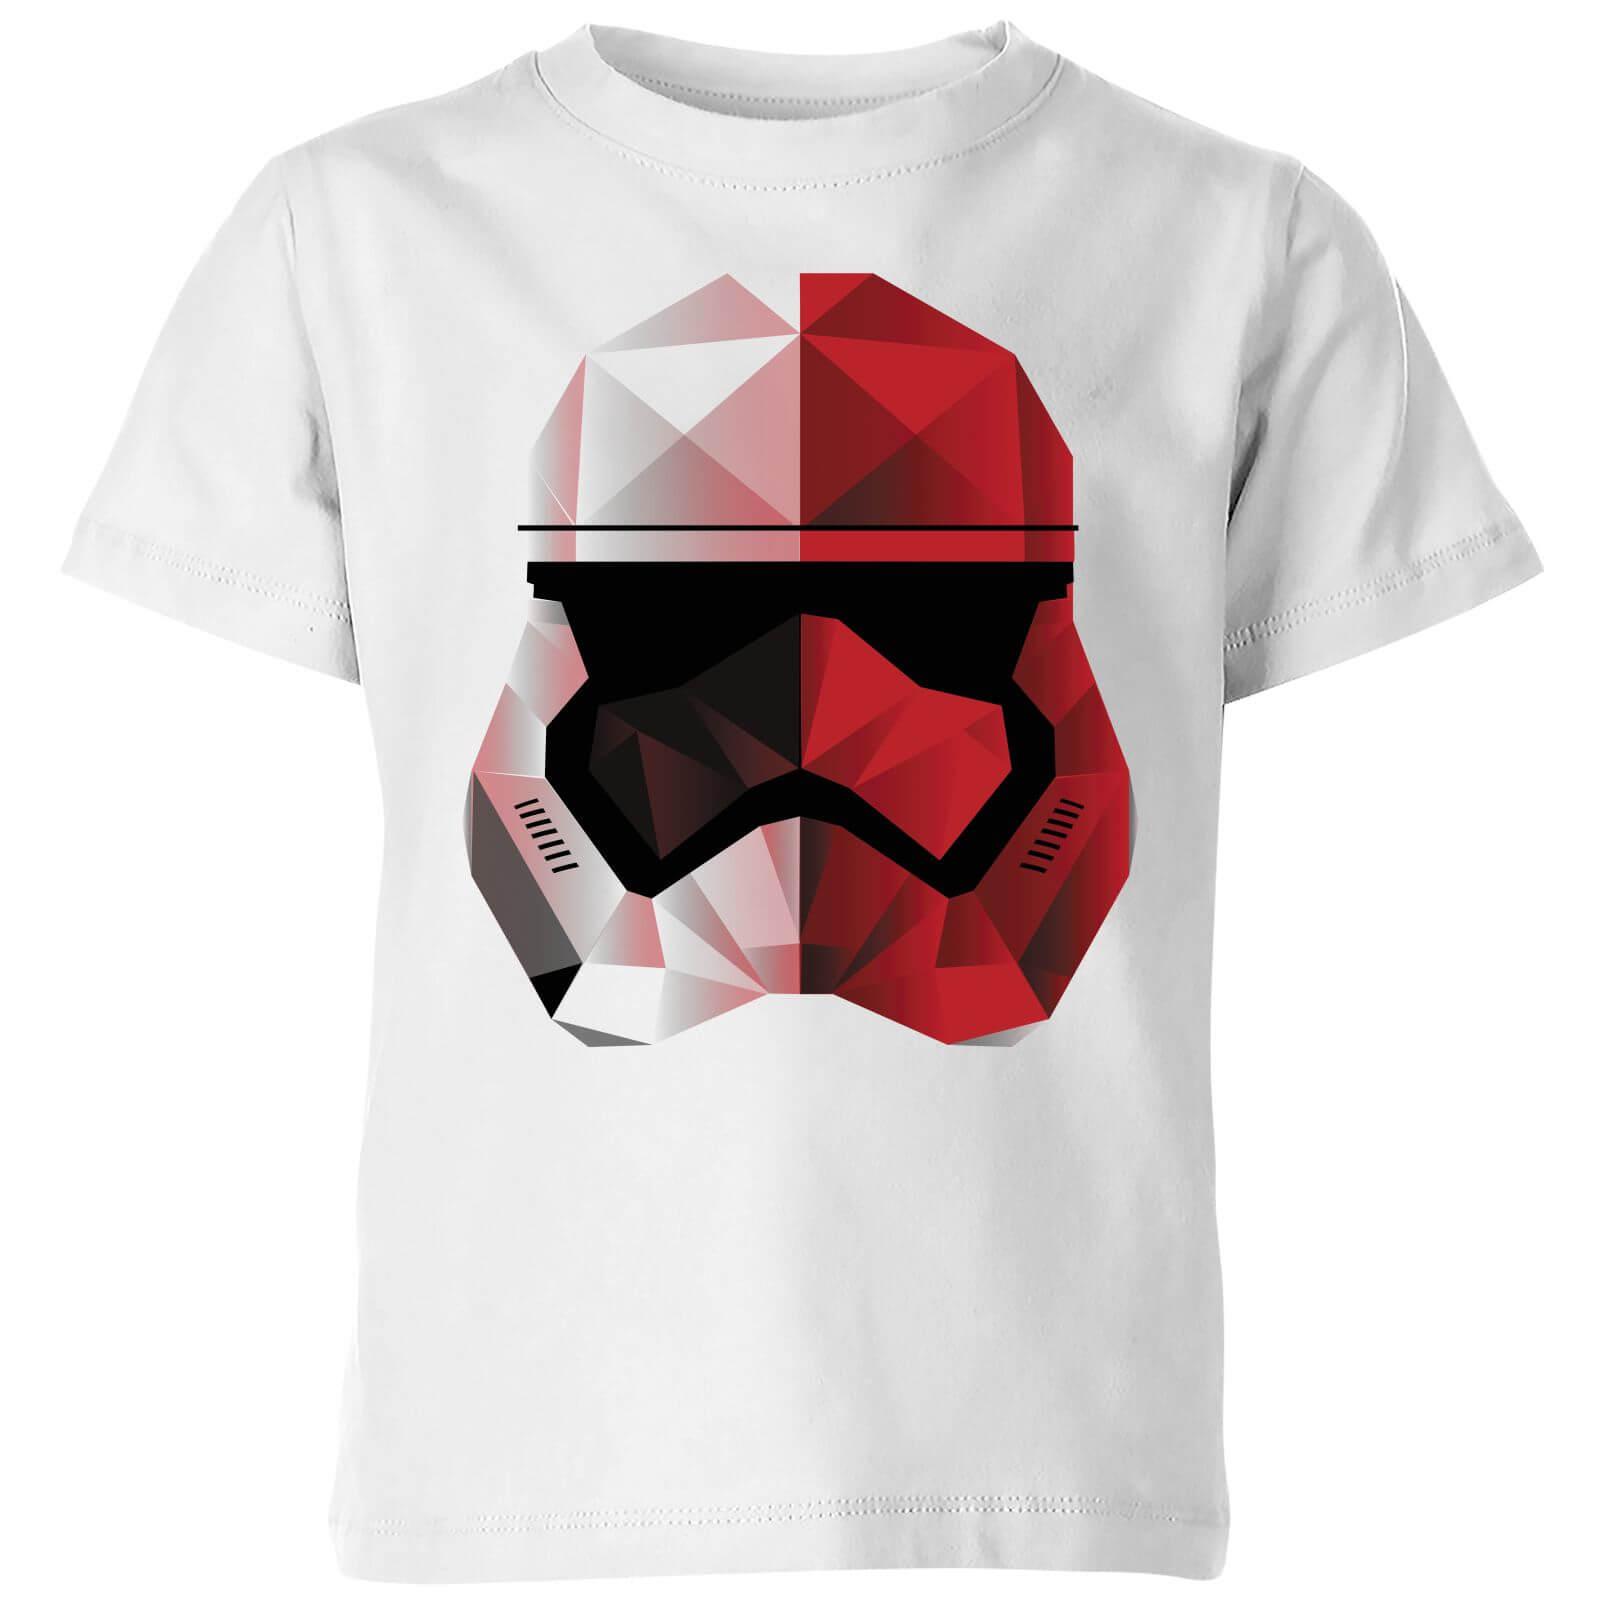 Star Wars T-Shirt Enfant Casque Stormtrooper Effet Cubiste - Star Wars - Blanc - 3-4 ans - Blanc